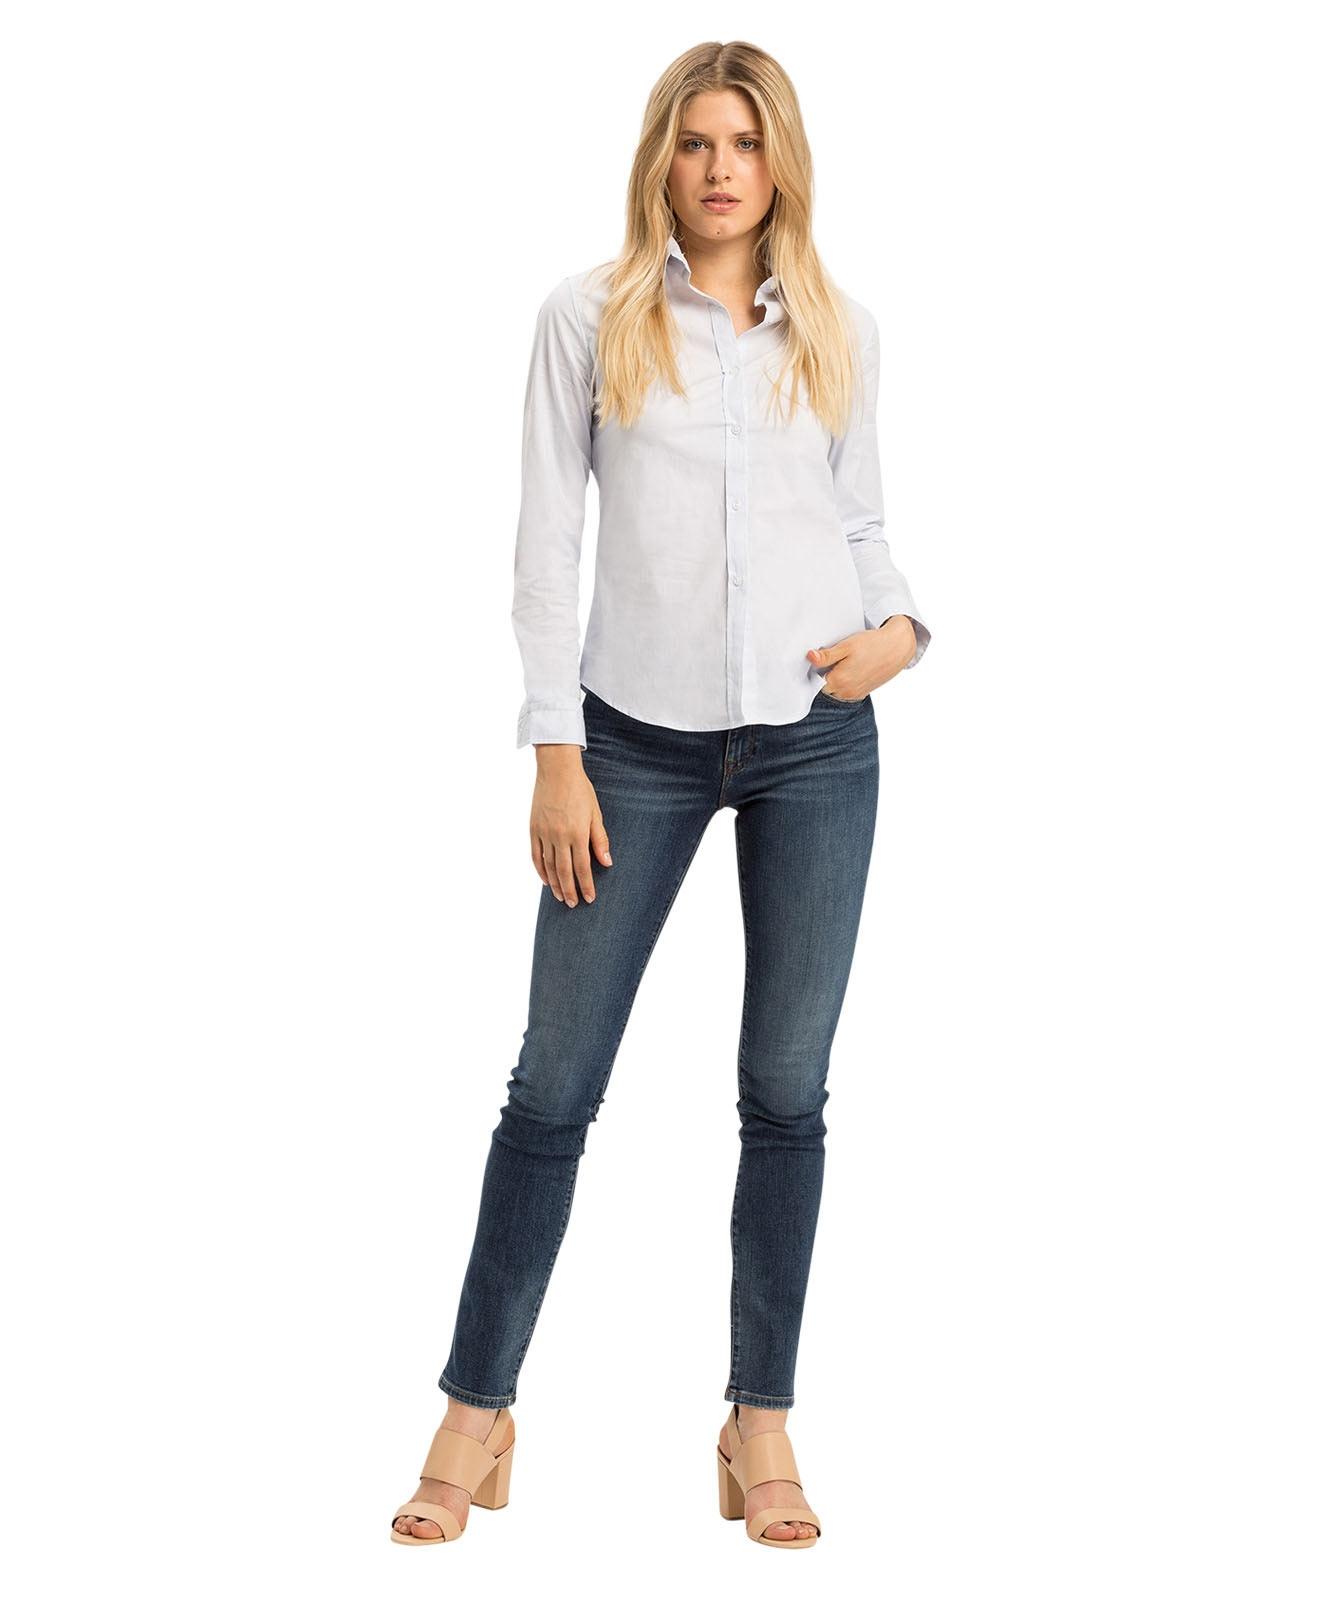 Hosen - Cross Mom Jeans Anya in Dark Blue  - Onlineshop Jeans Meile